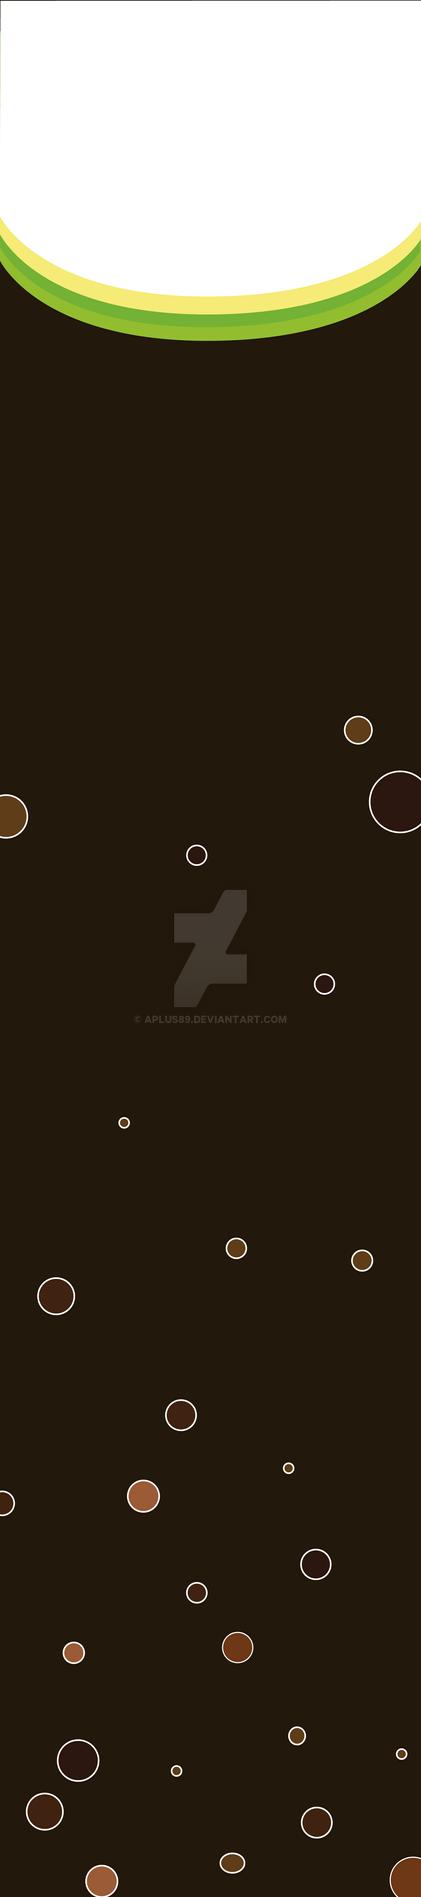 Vertical Banner Beverage (Brown) by aplus89